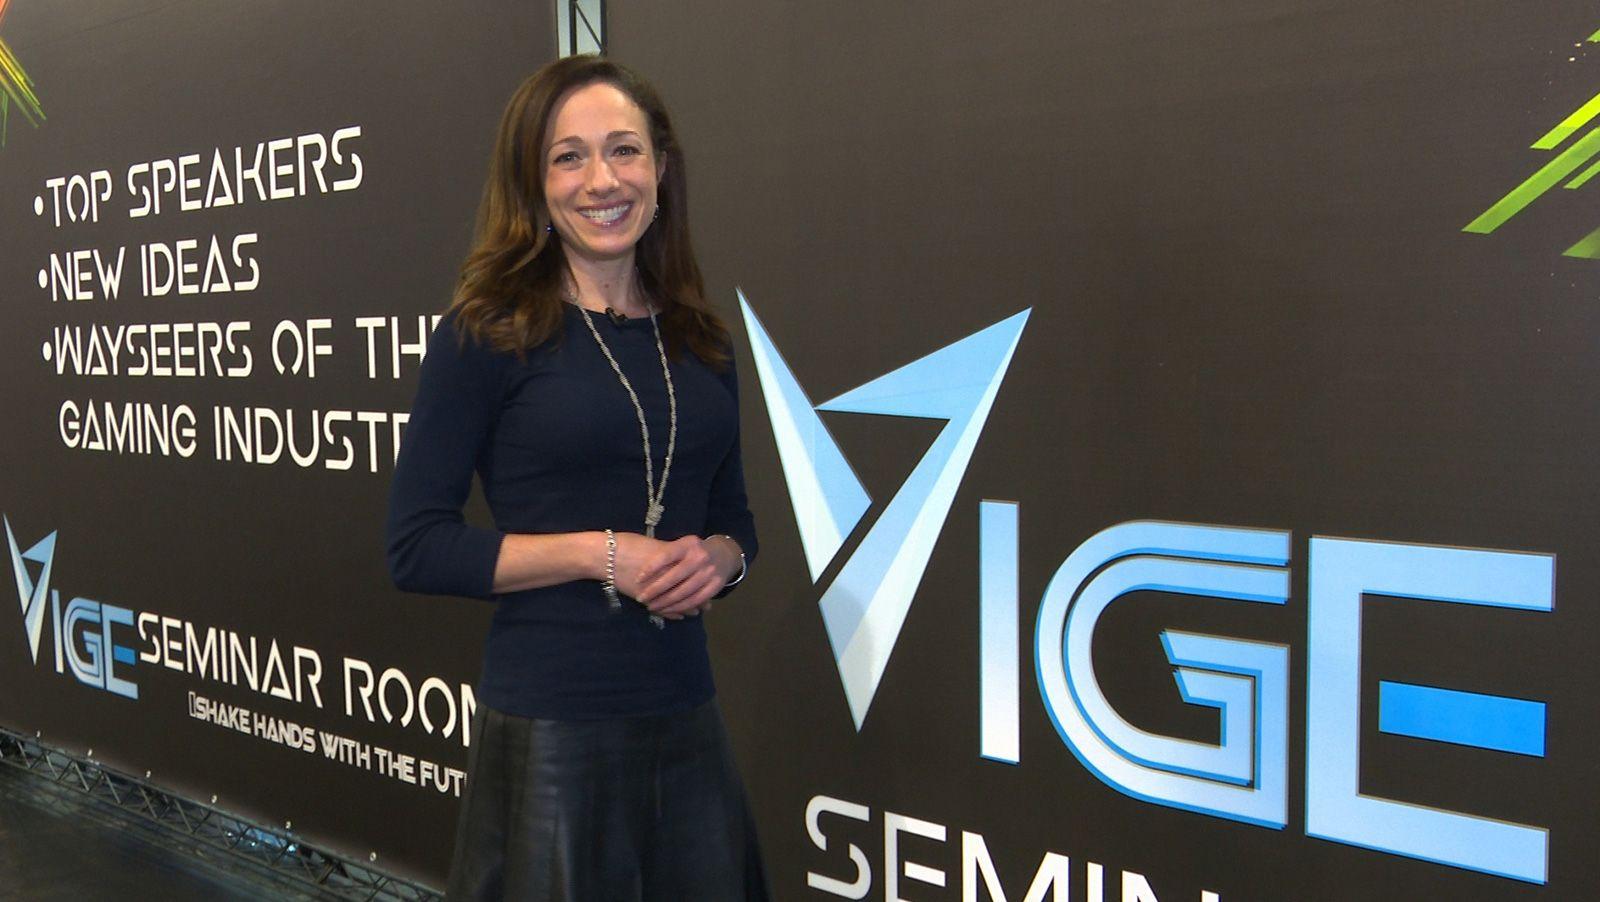 Vienna International Gaming Expo (ViGE) 2017 day 1 recap